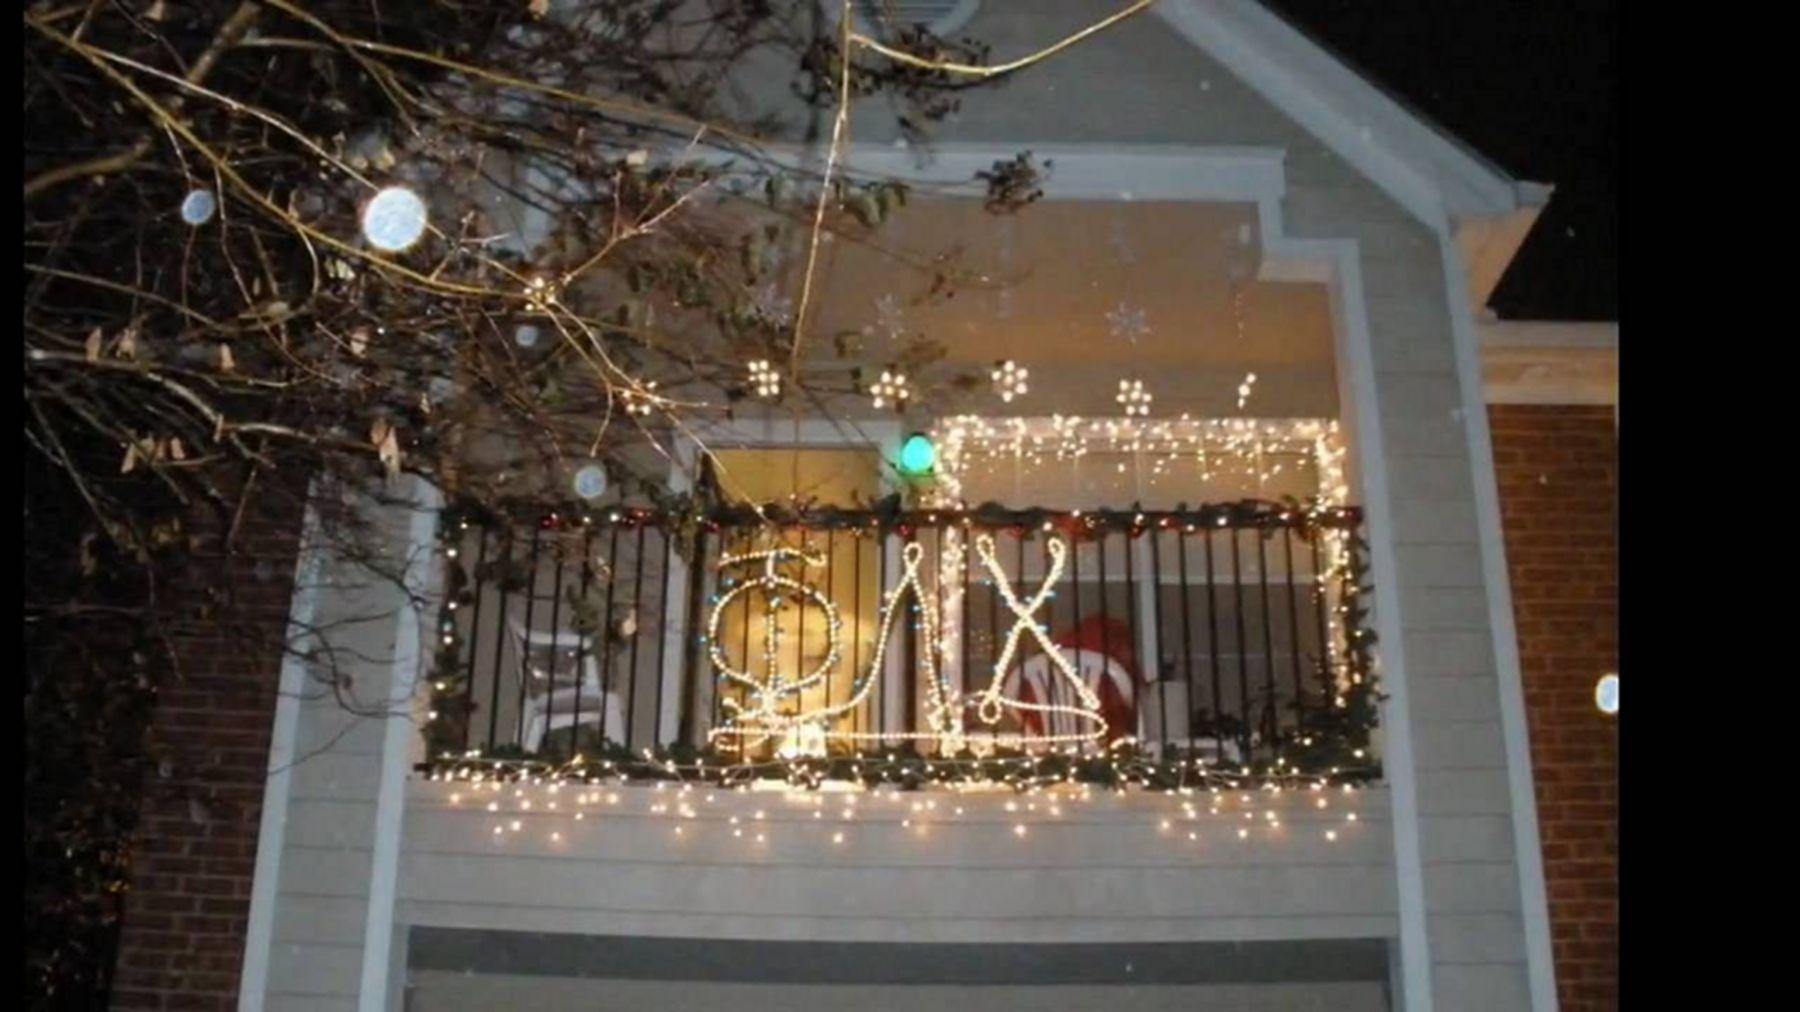 20 cool christmas lights decorating ideas for balcony terrace decor outdoor balcony balcony on christmas balcony decorations apartment patio id=59784